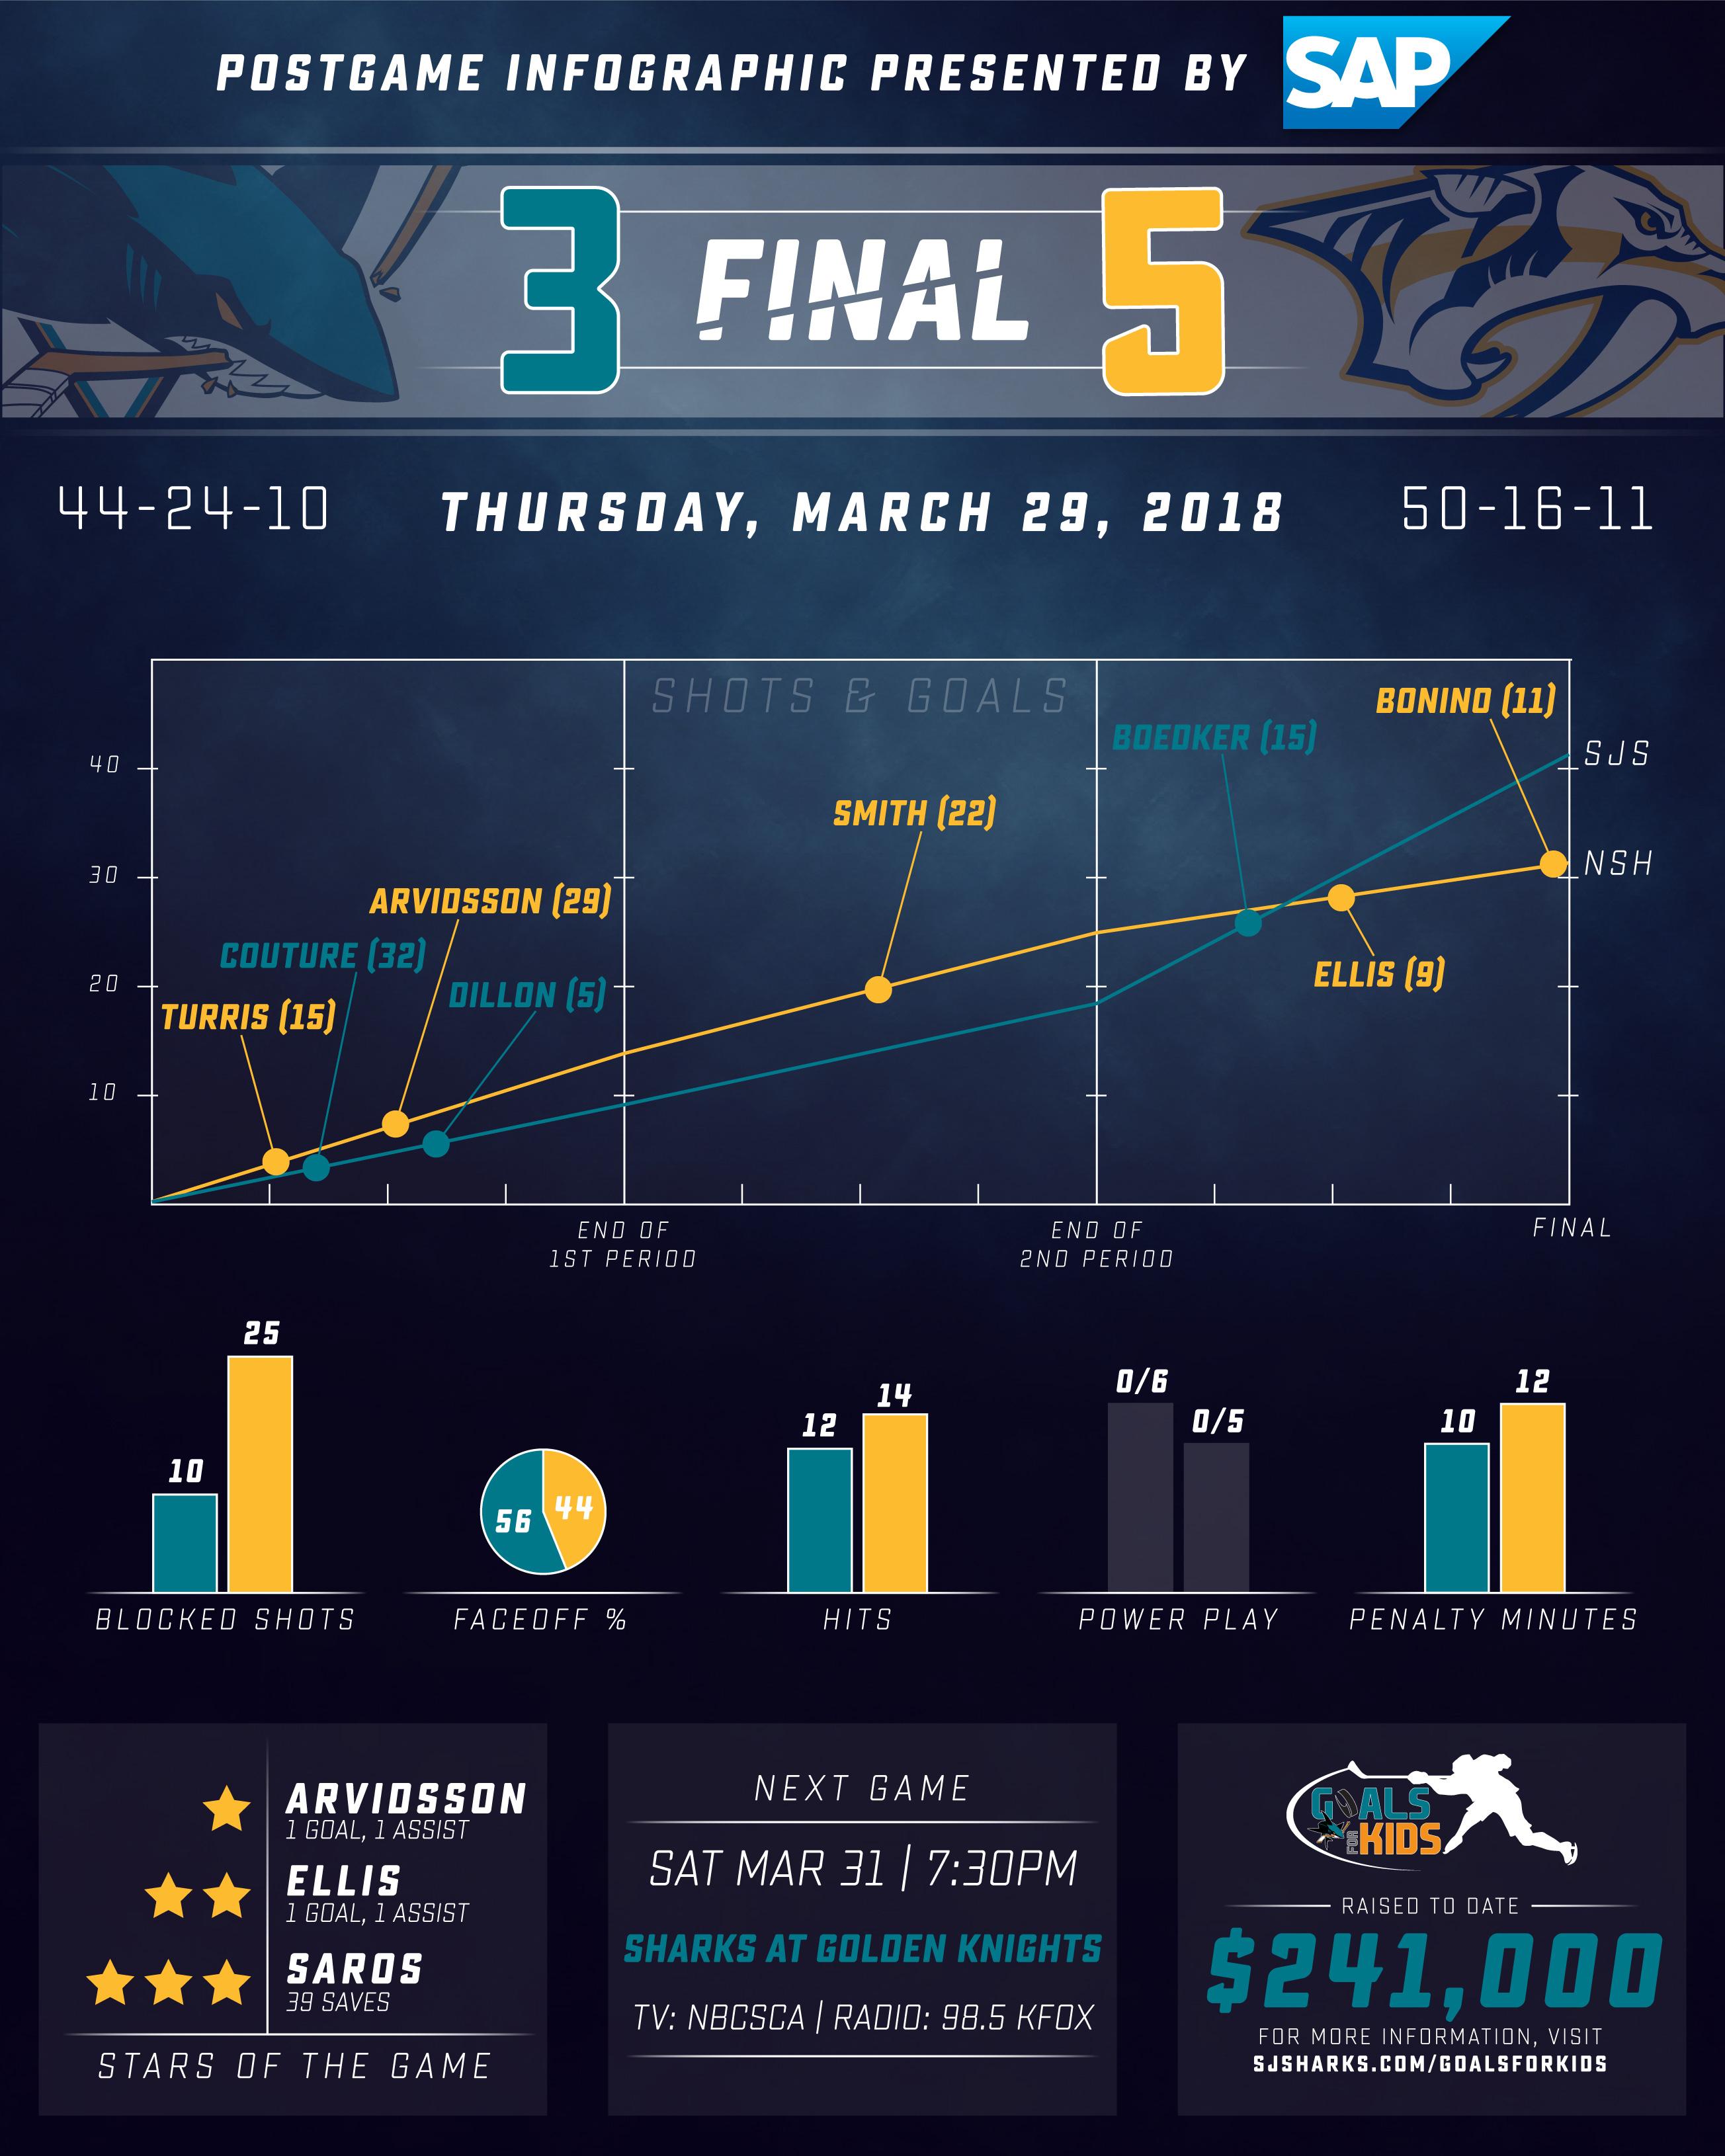 Postgame Infographic: Sharks vs Predators